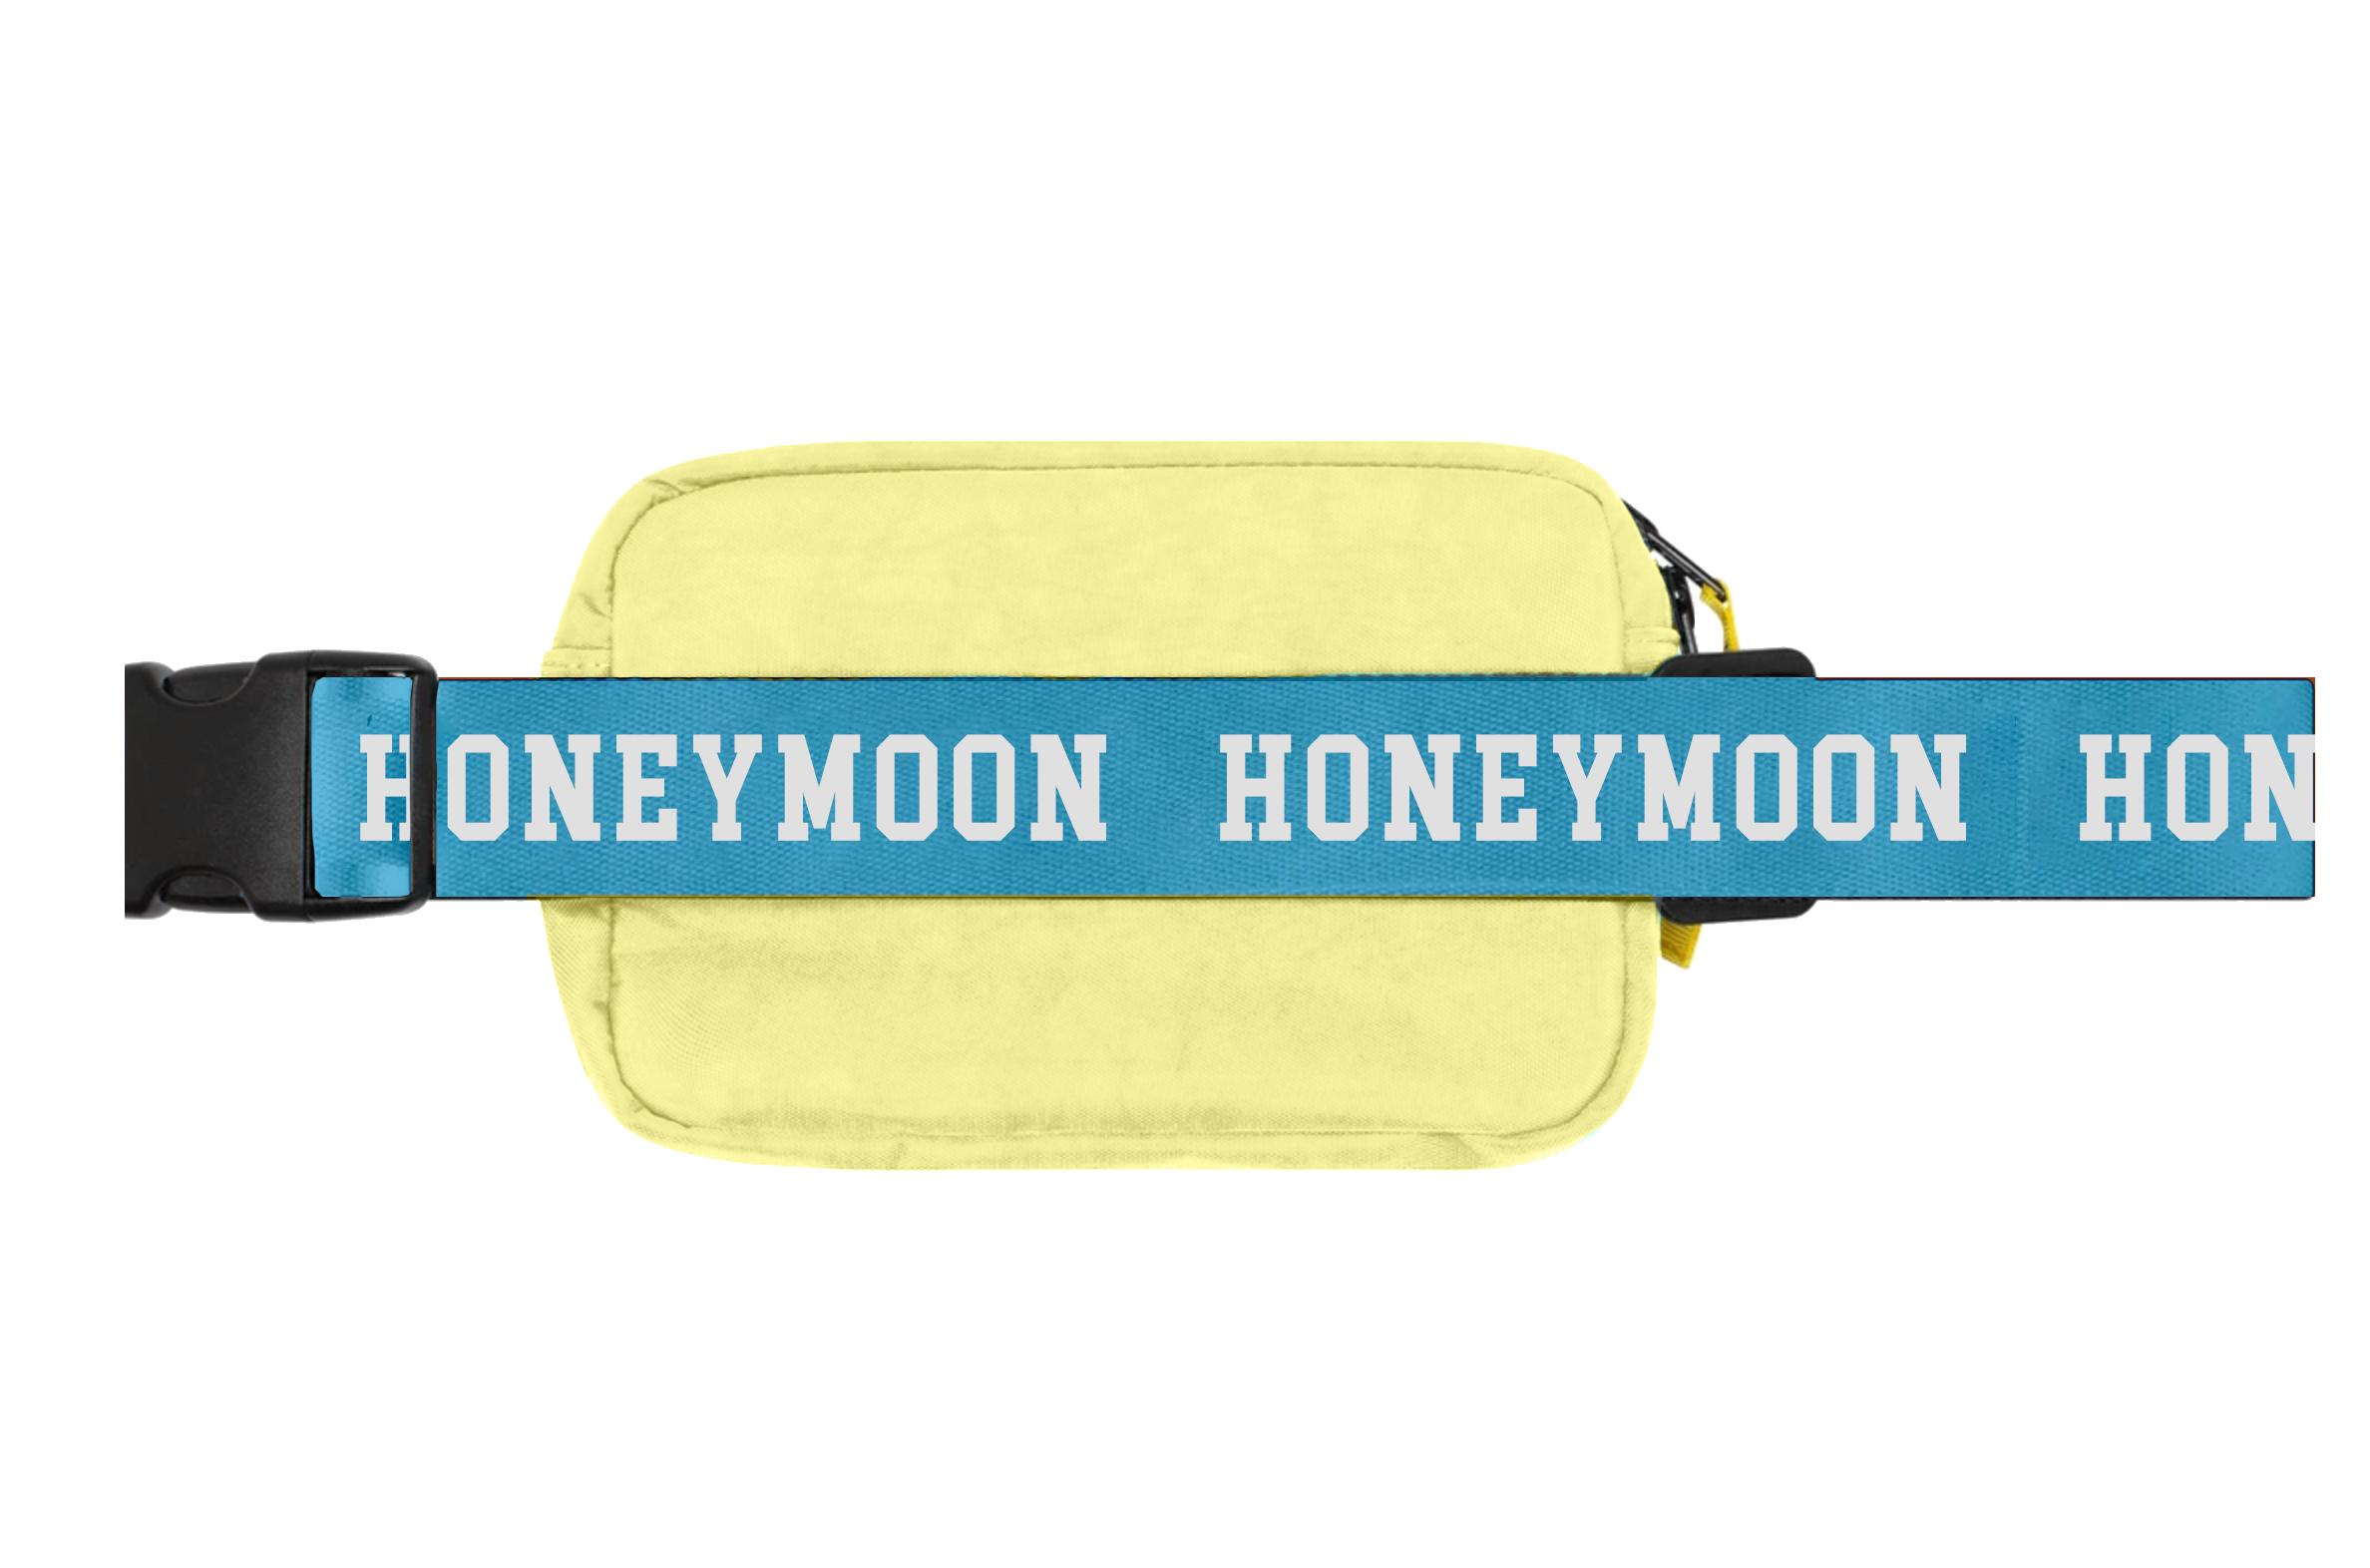 Honeymoon Fanny Pack